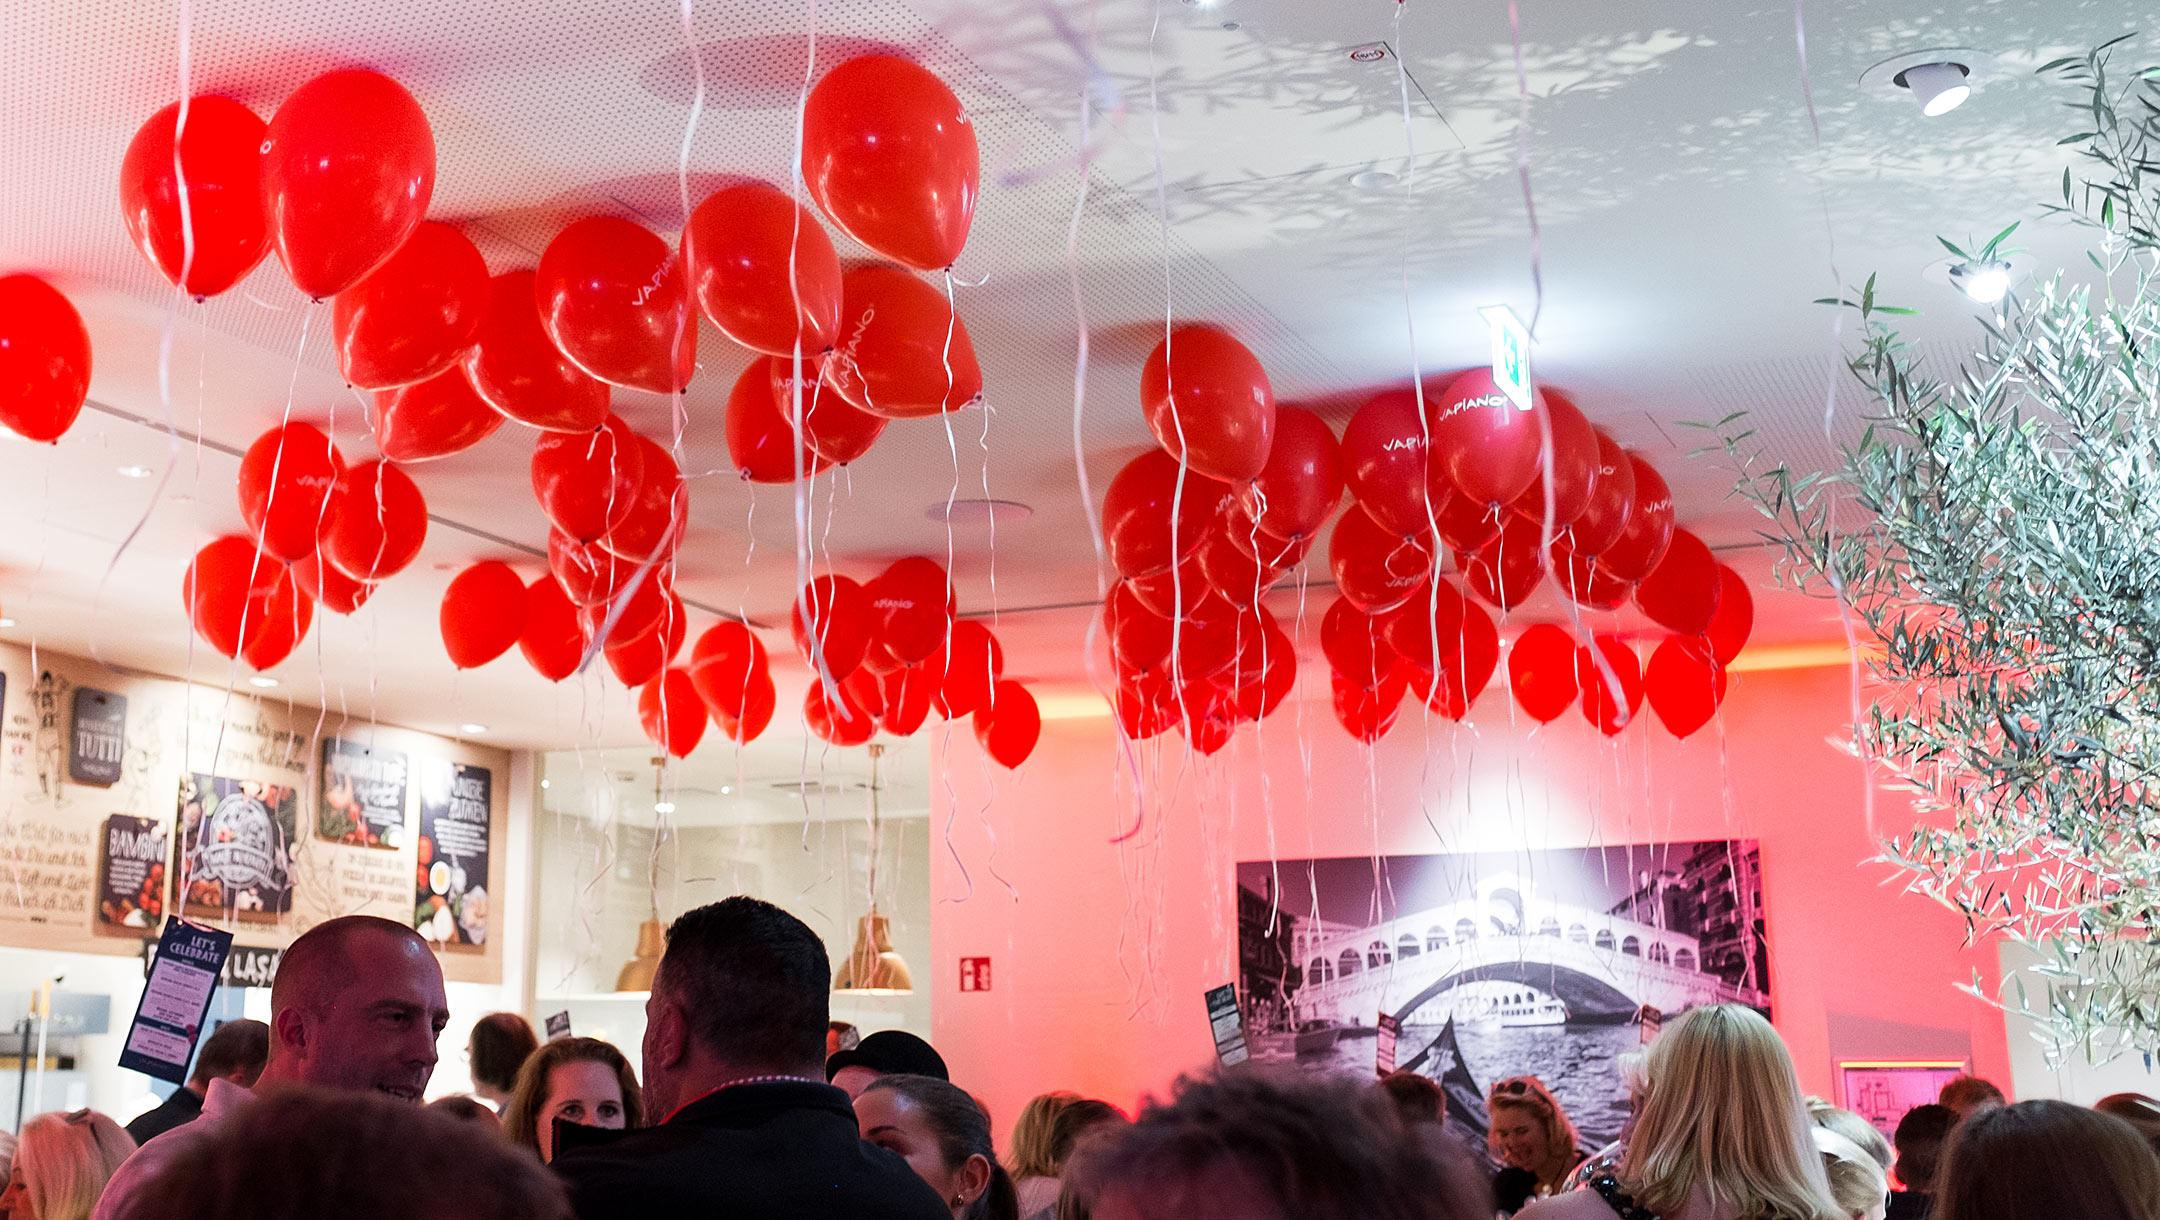 Vapiano Essen Rüttenscheider Strasse Opening Sunnyinga Lifestyle Blog